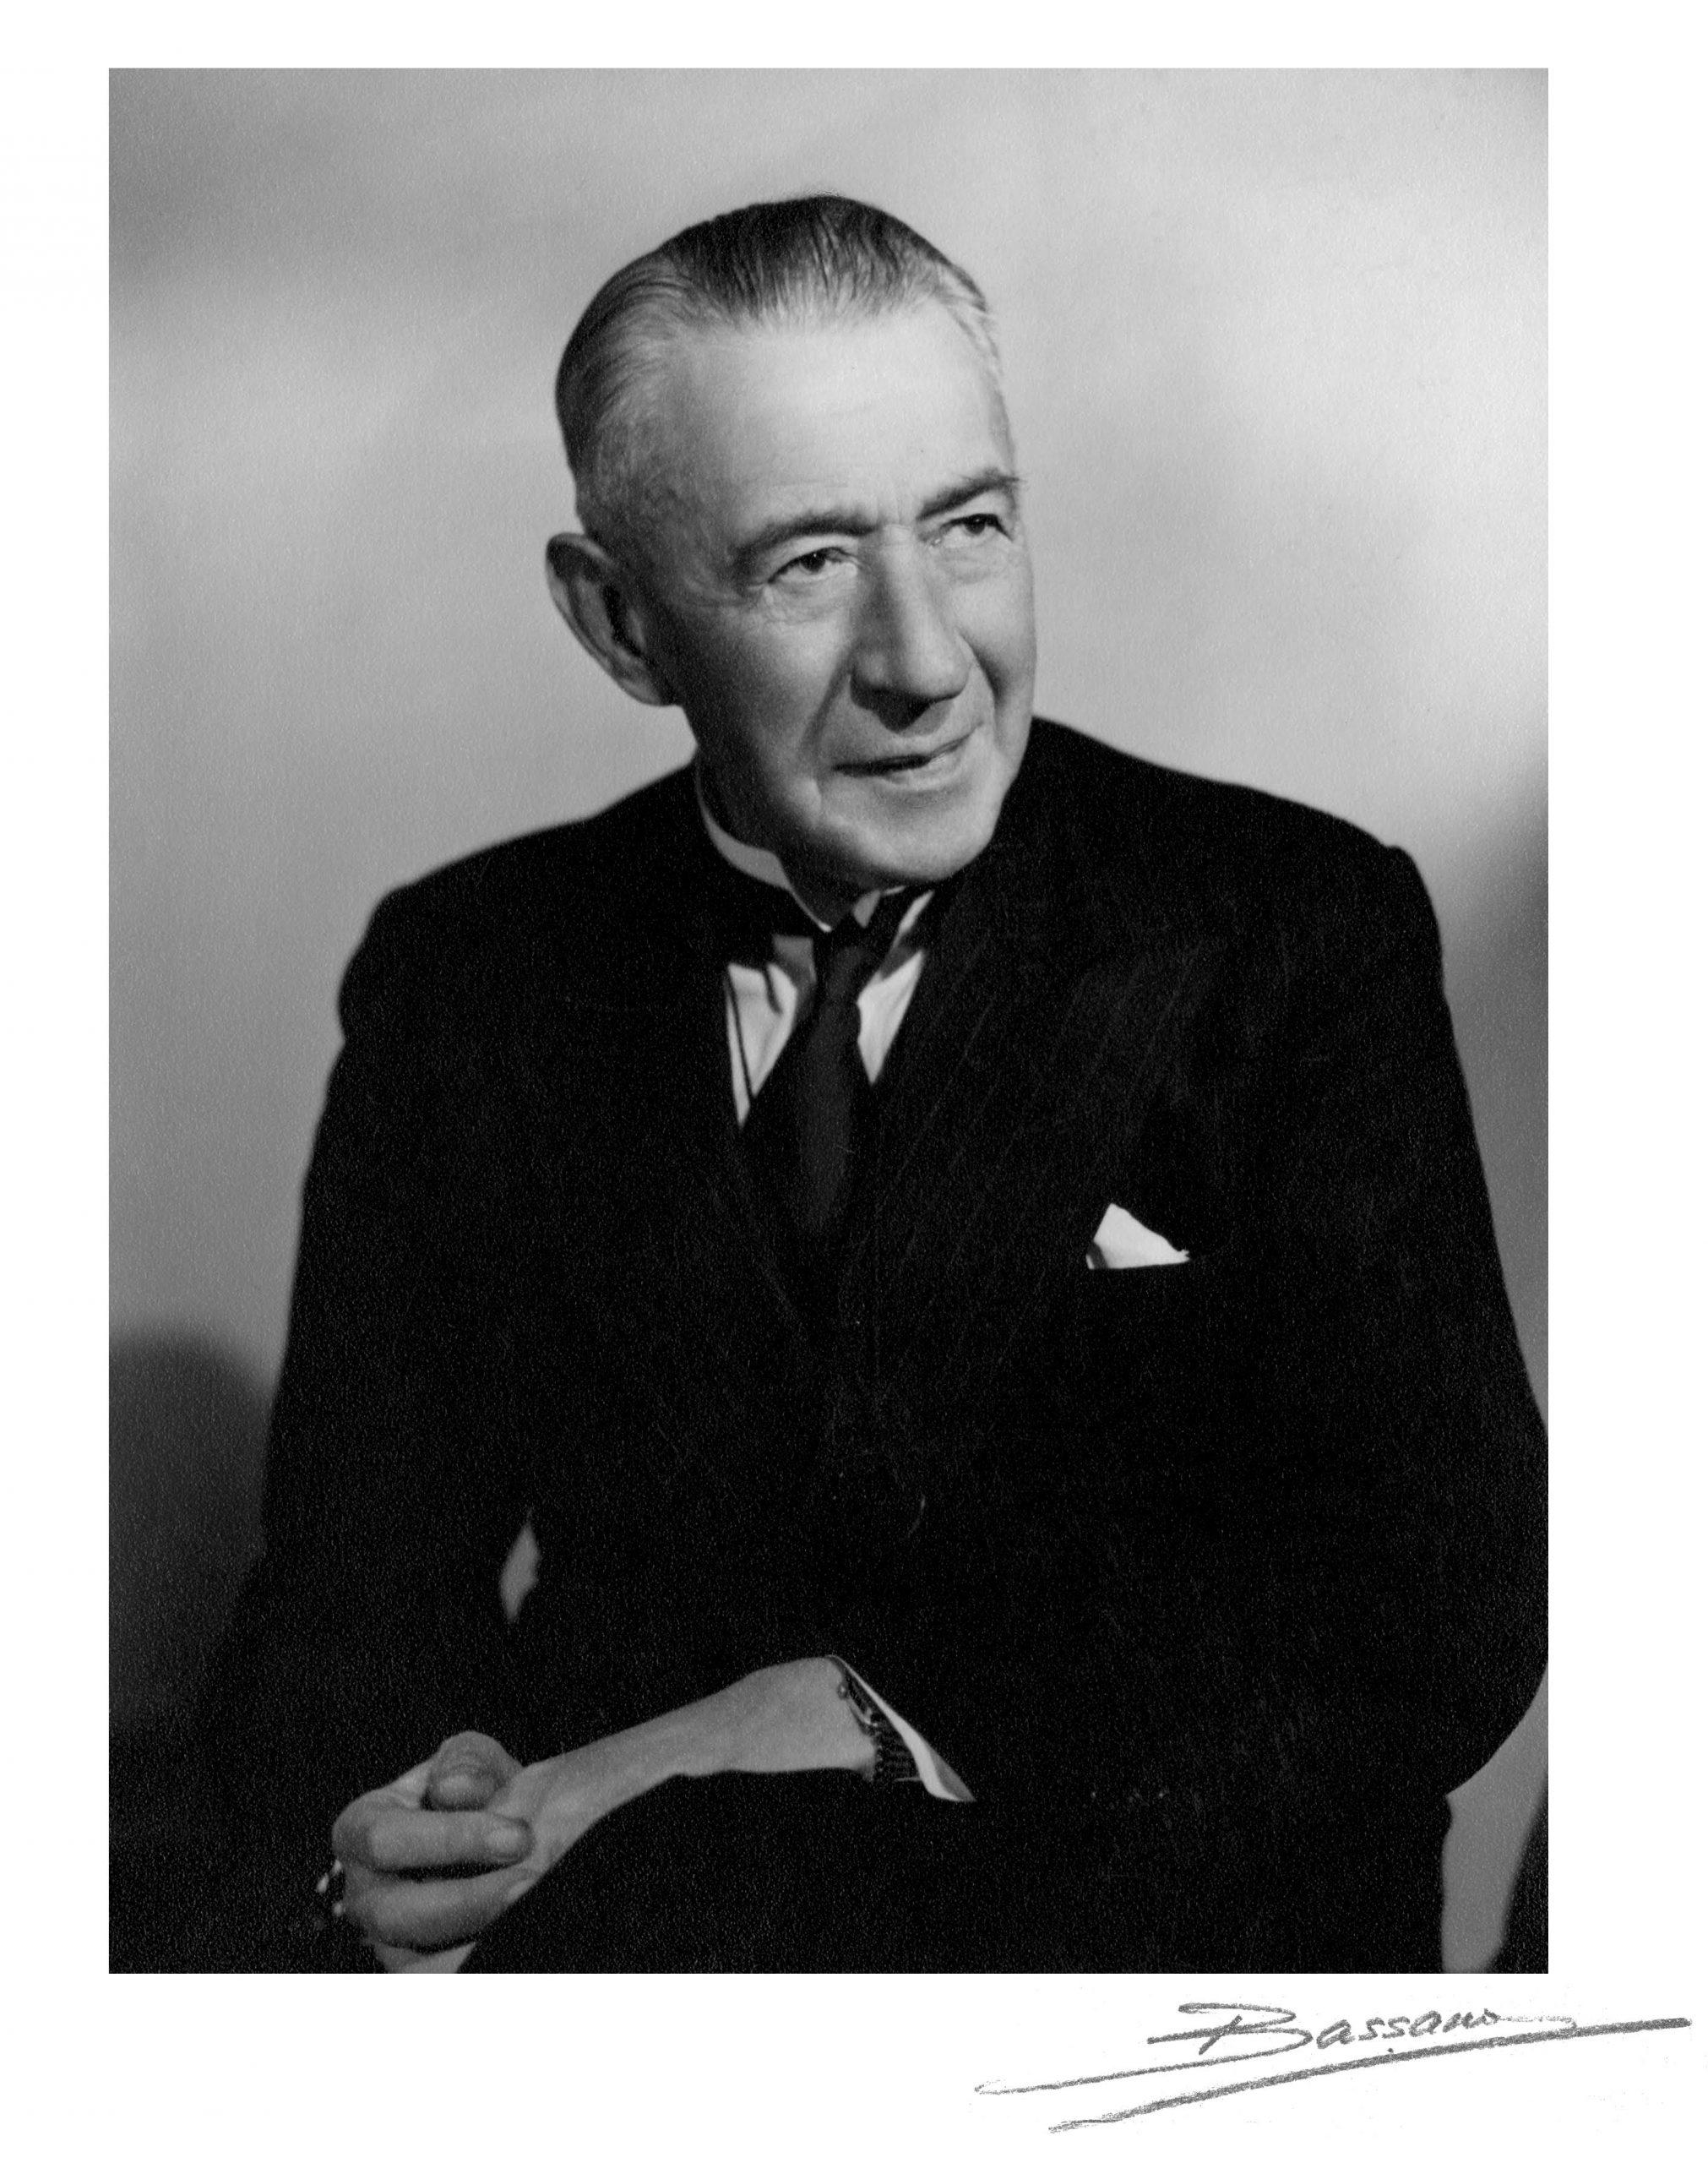 James Colquhoun Irvine and the Commonwealth Fellowships